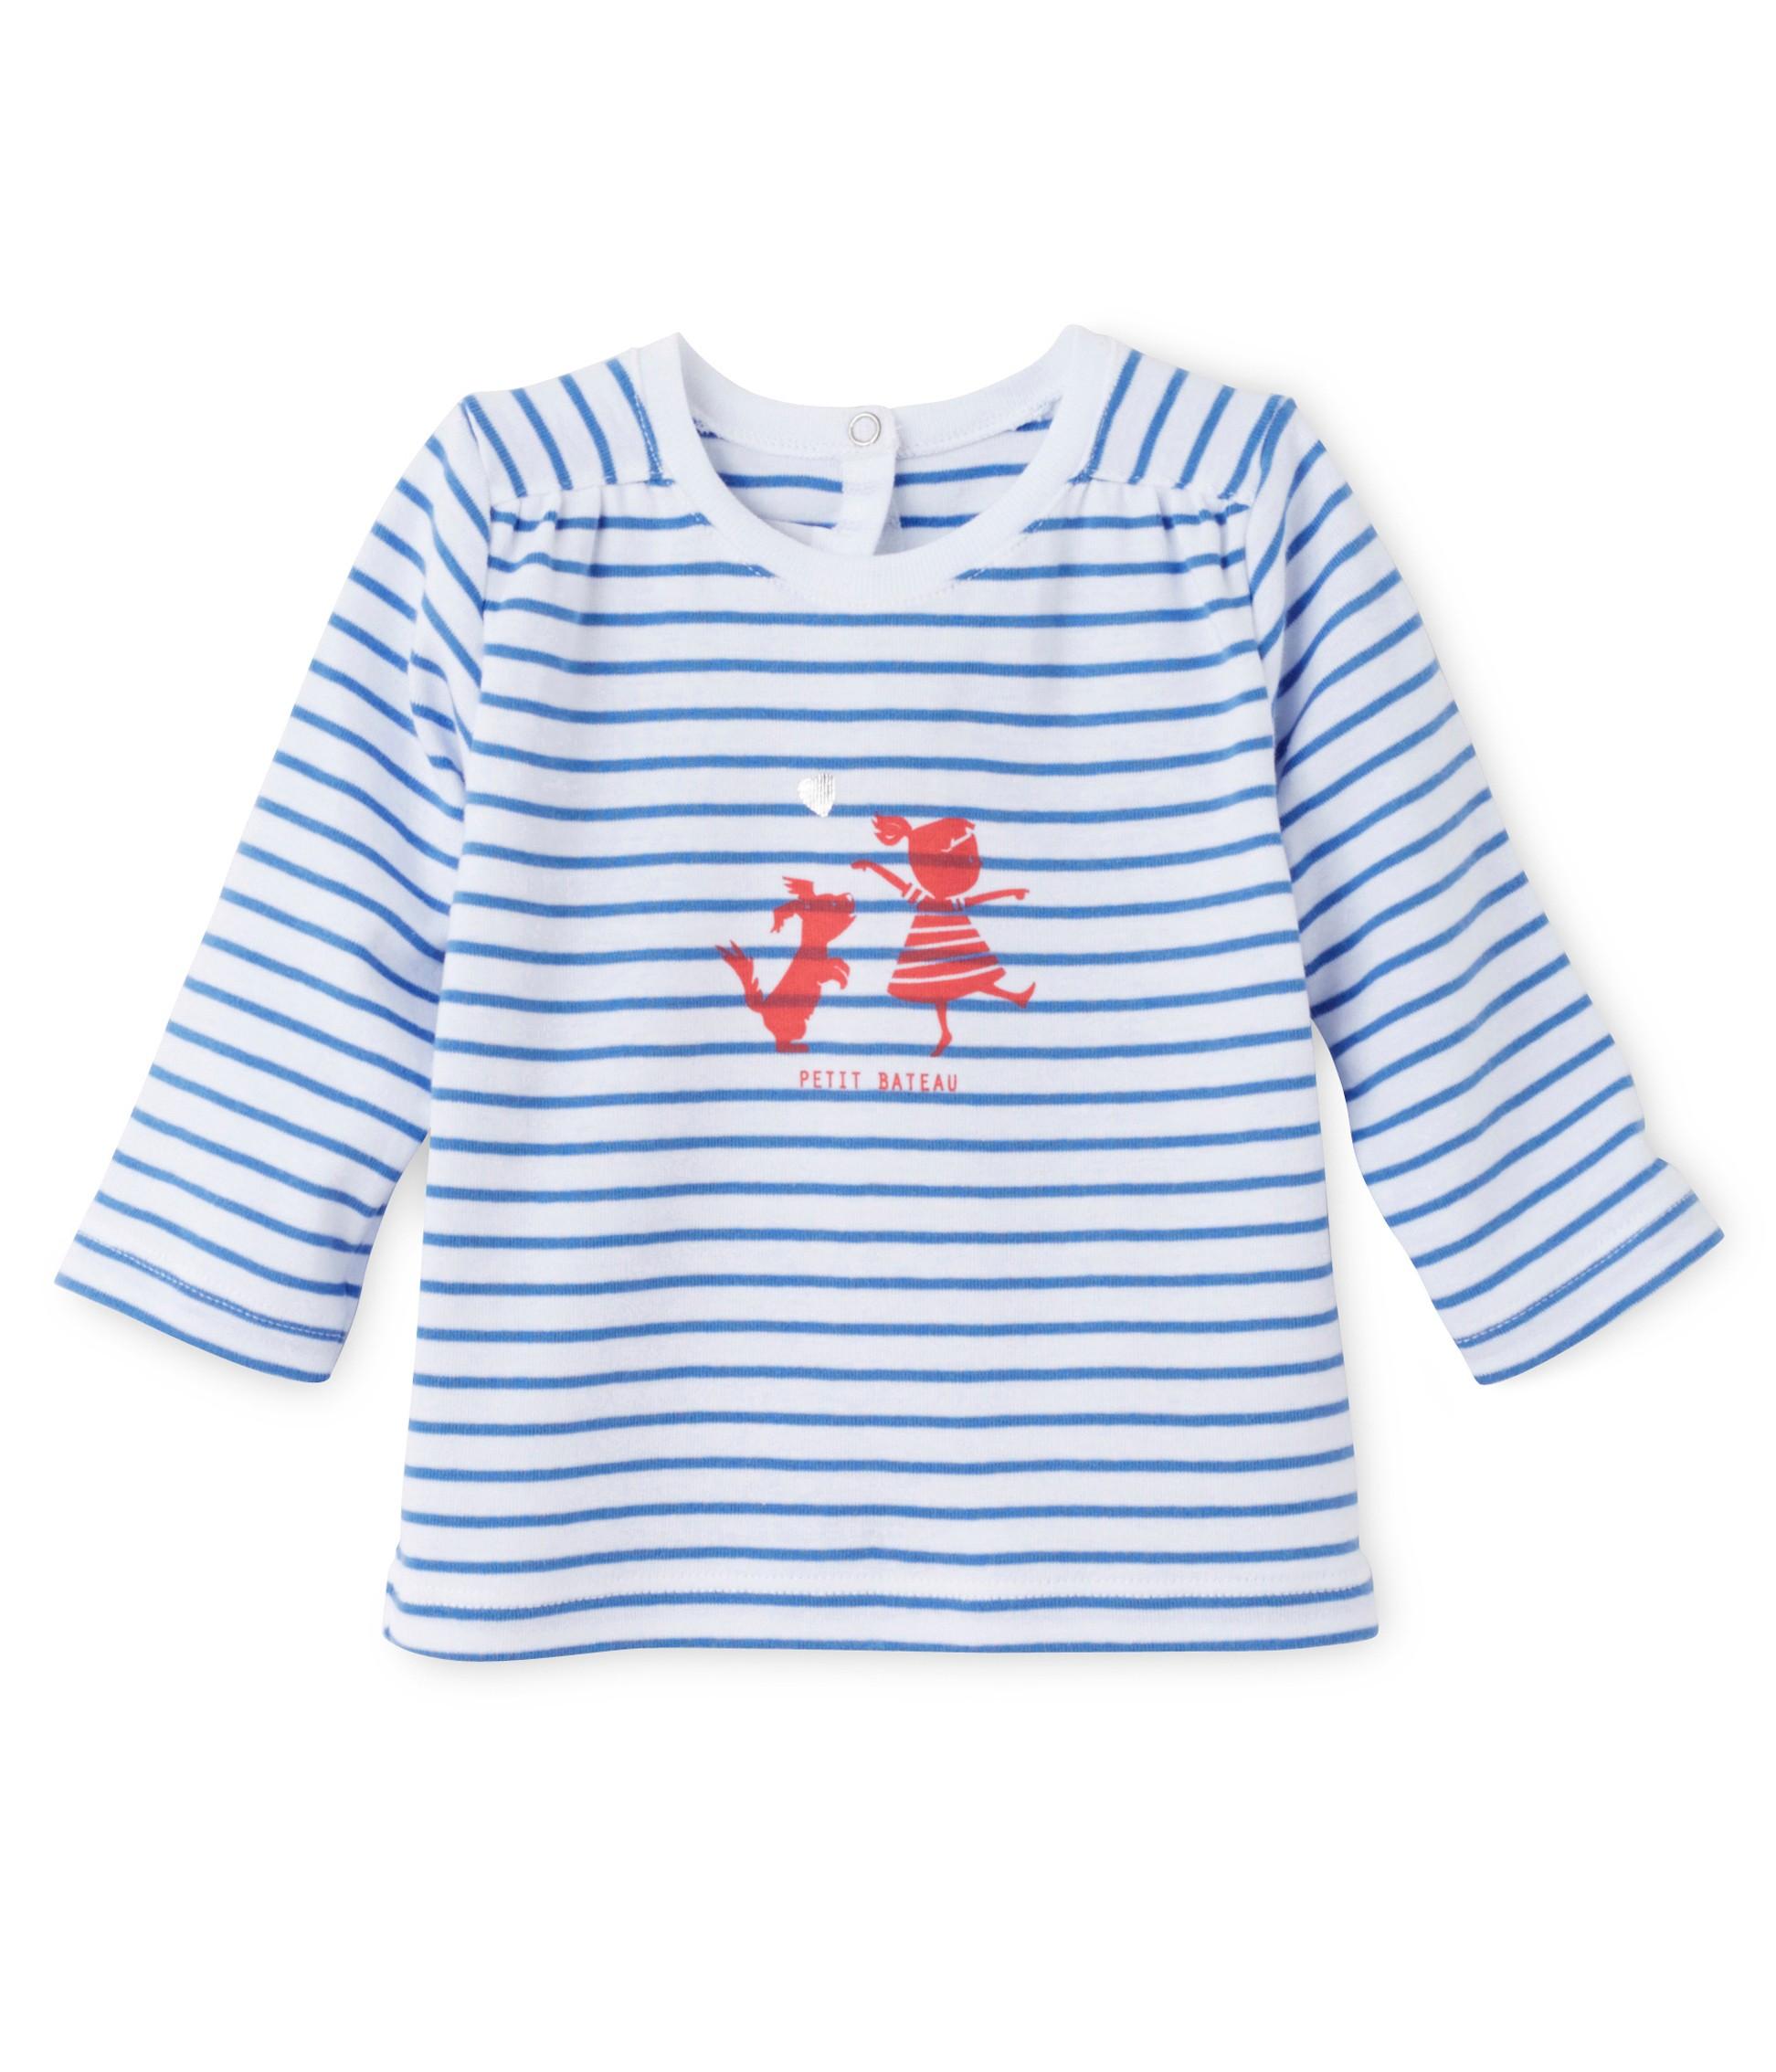 e631bb3ad98e Μπλούζα μακρυμάνικη ριγέ για μωρό κορίτσι - petit-bateau.gr